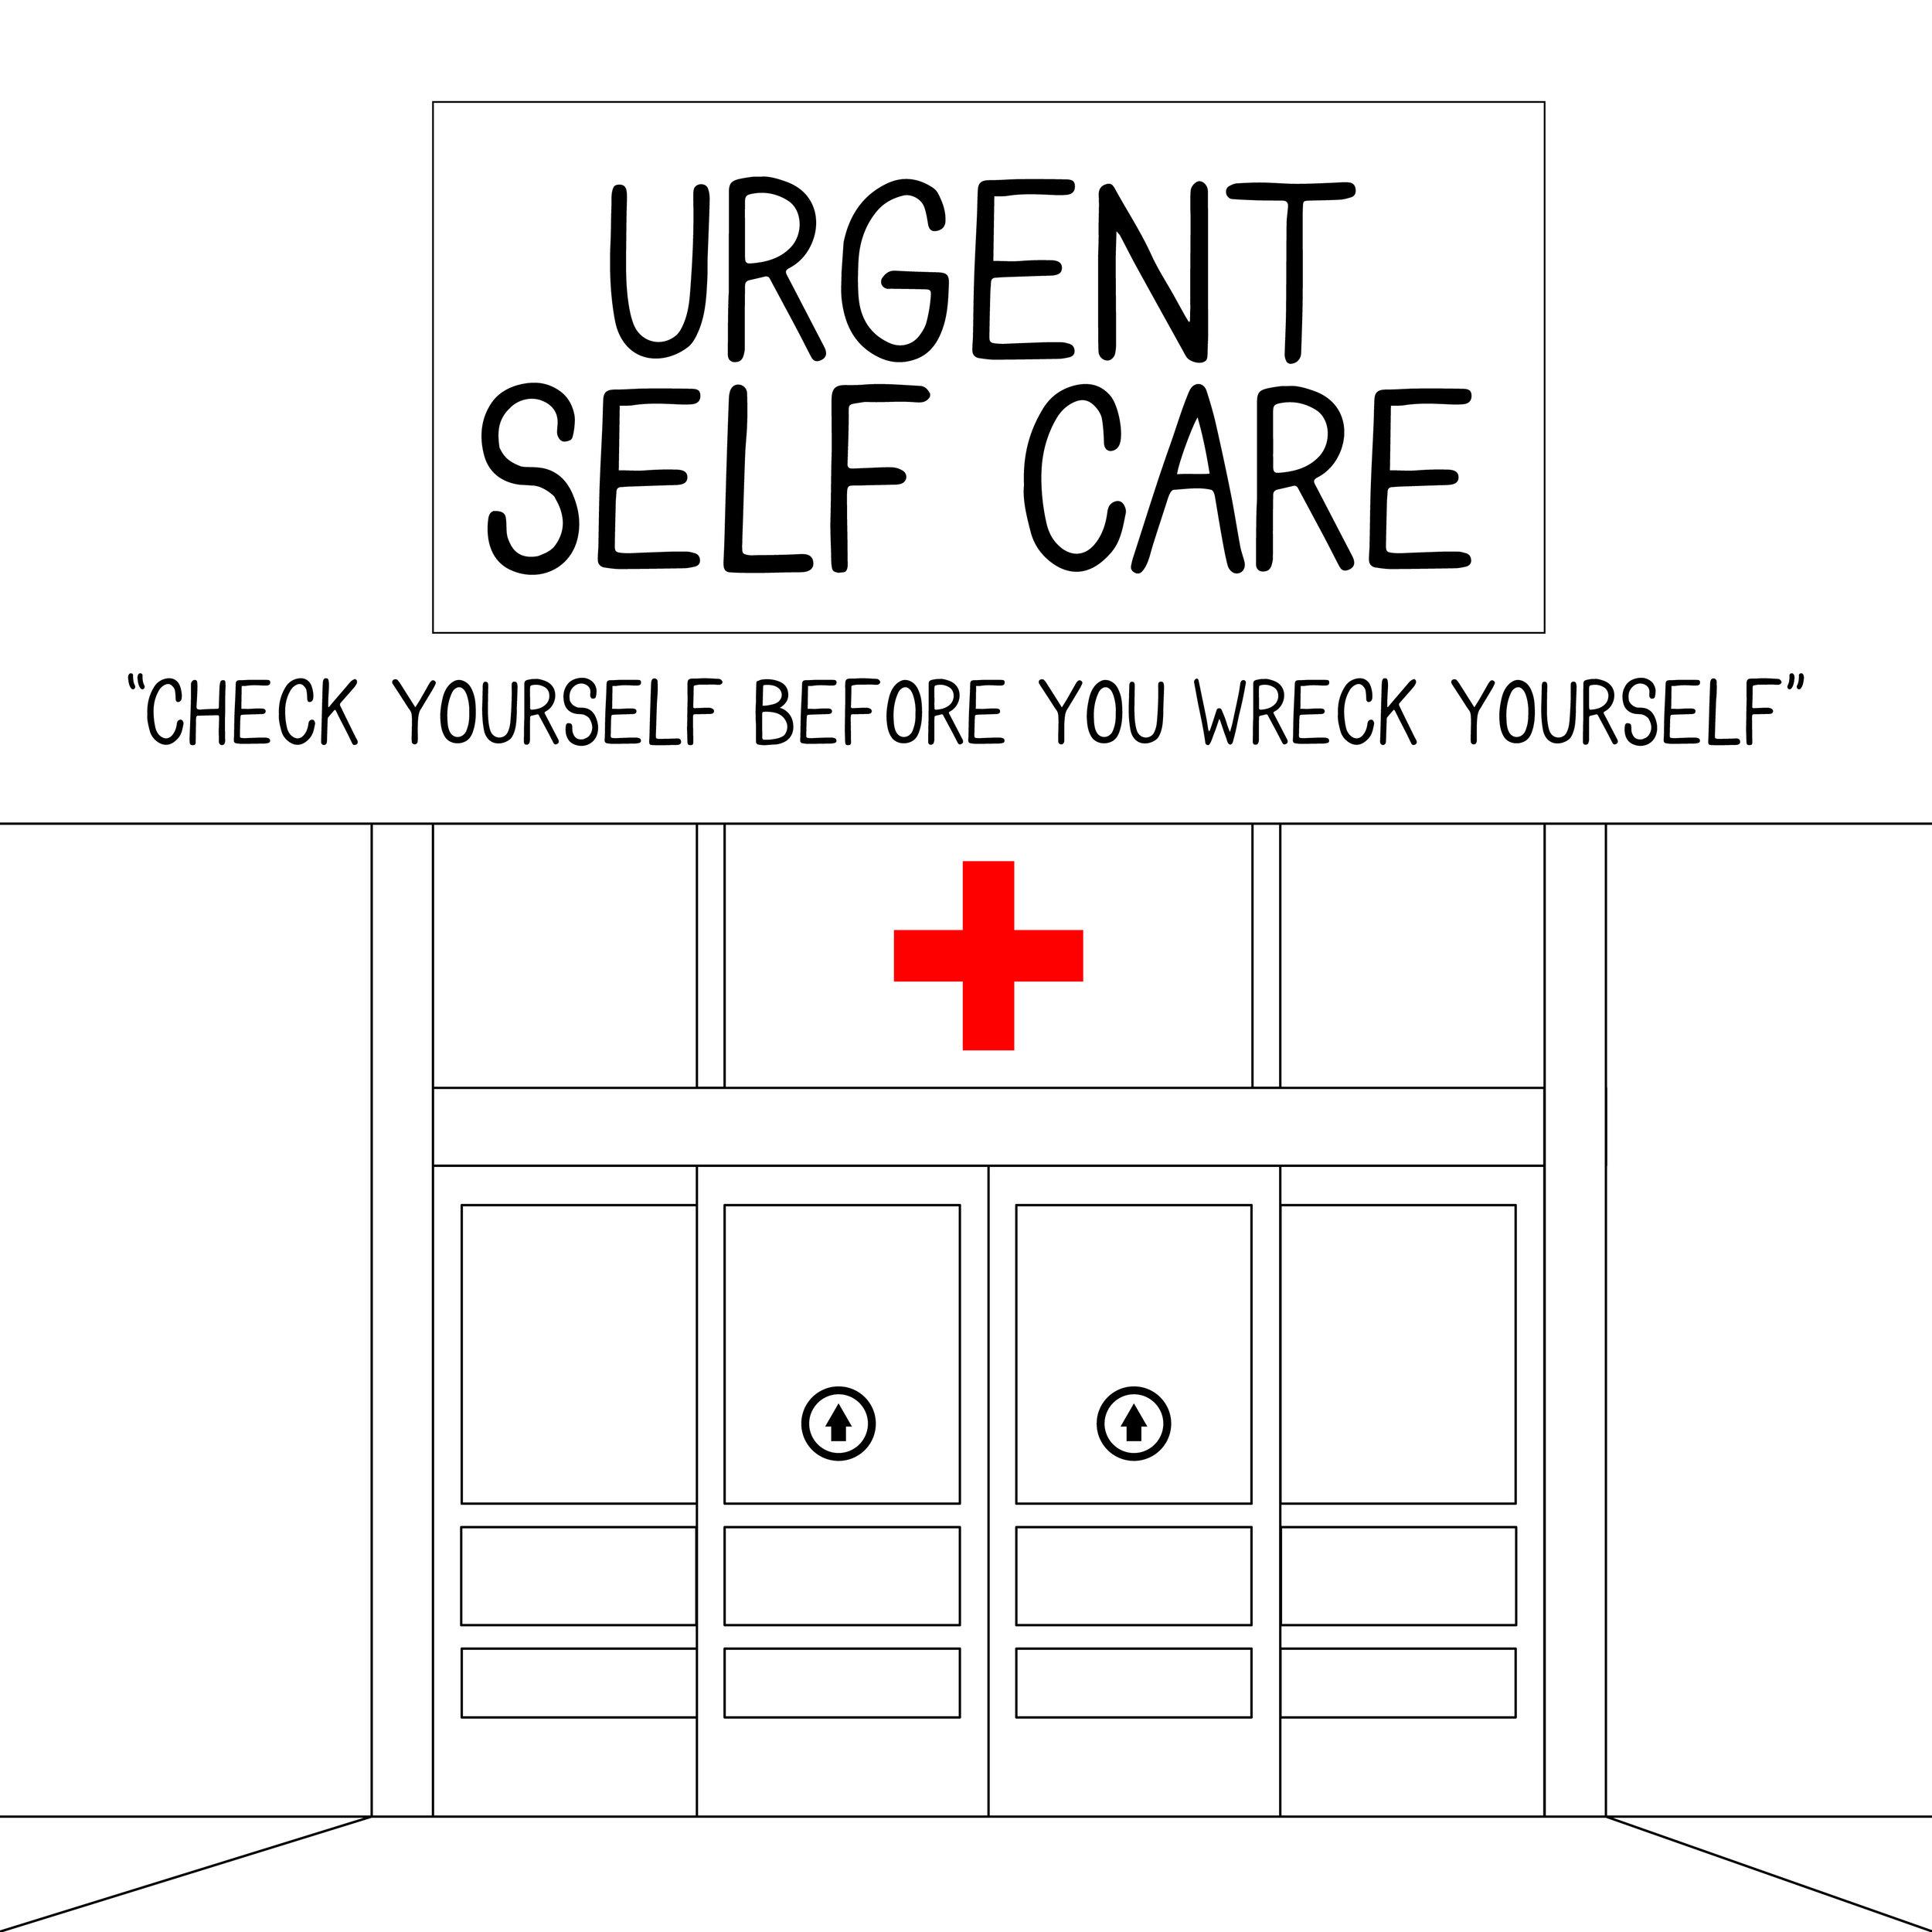 urgentselfcare-01.jpg